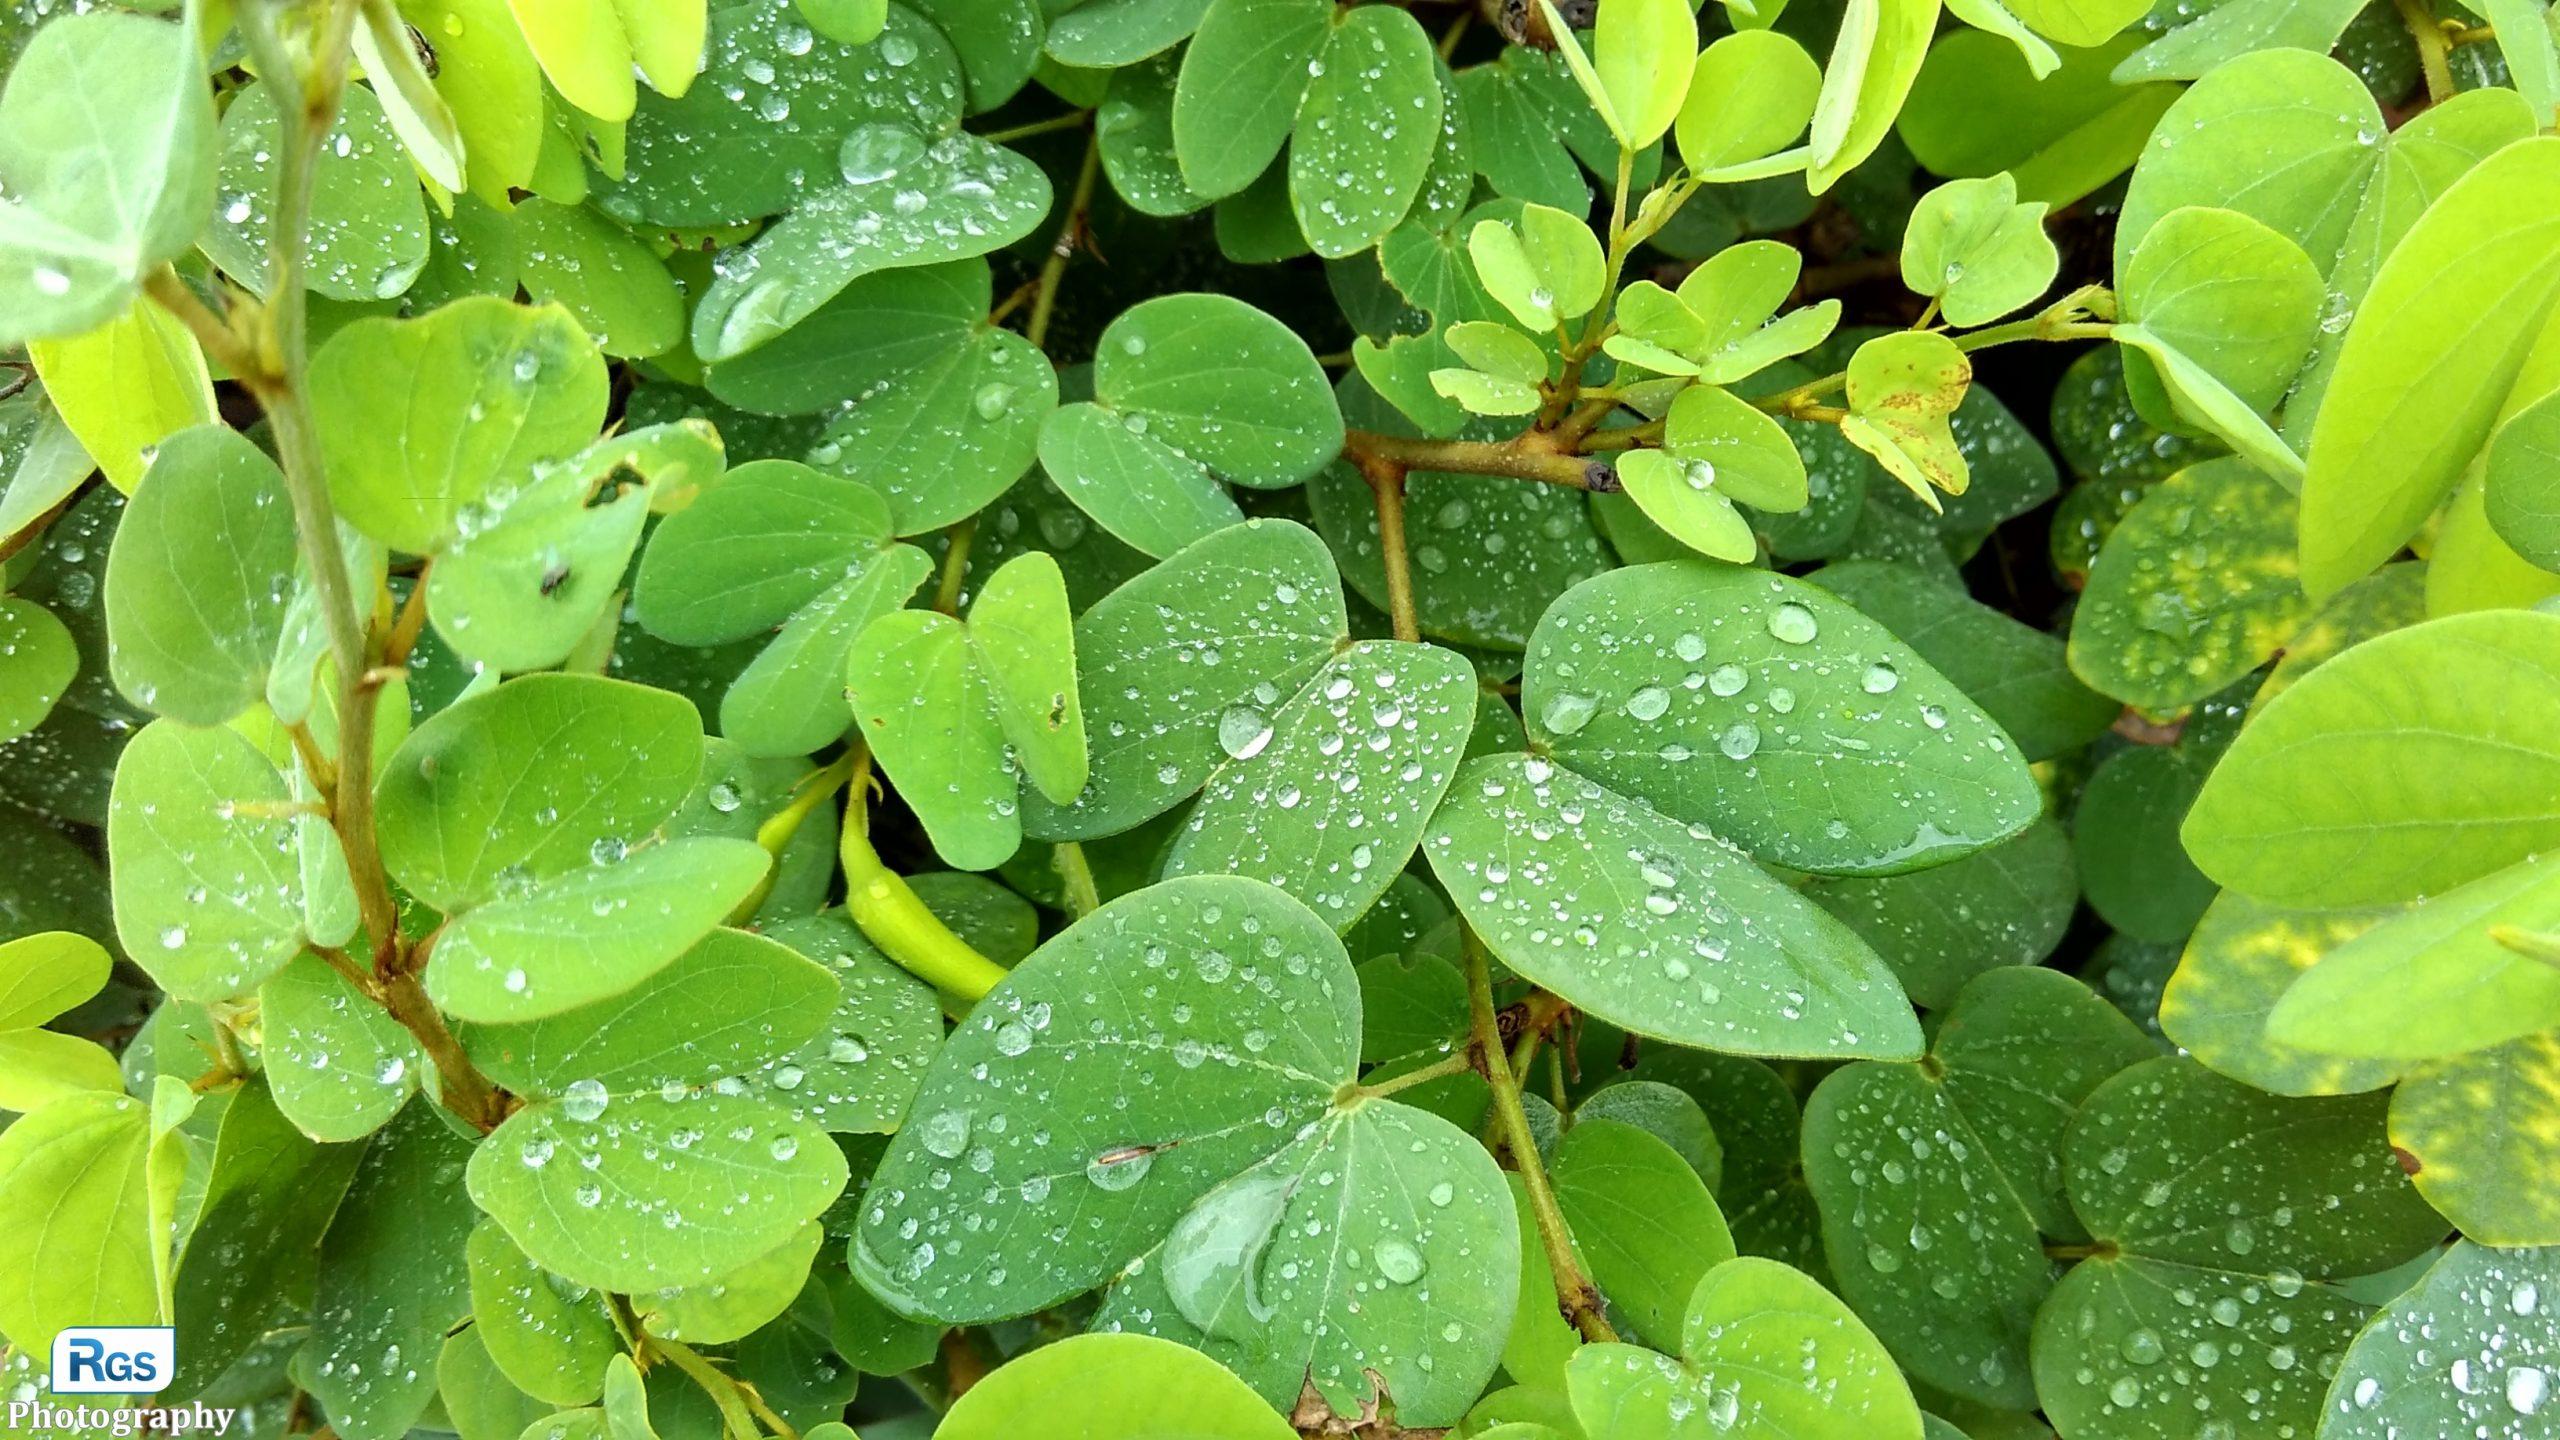 The Rain Drop on Leaf